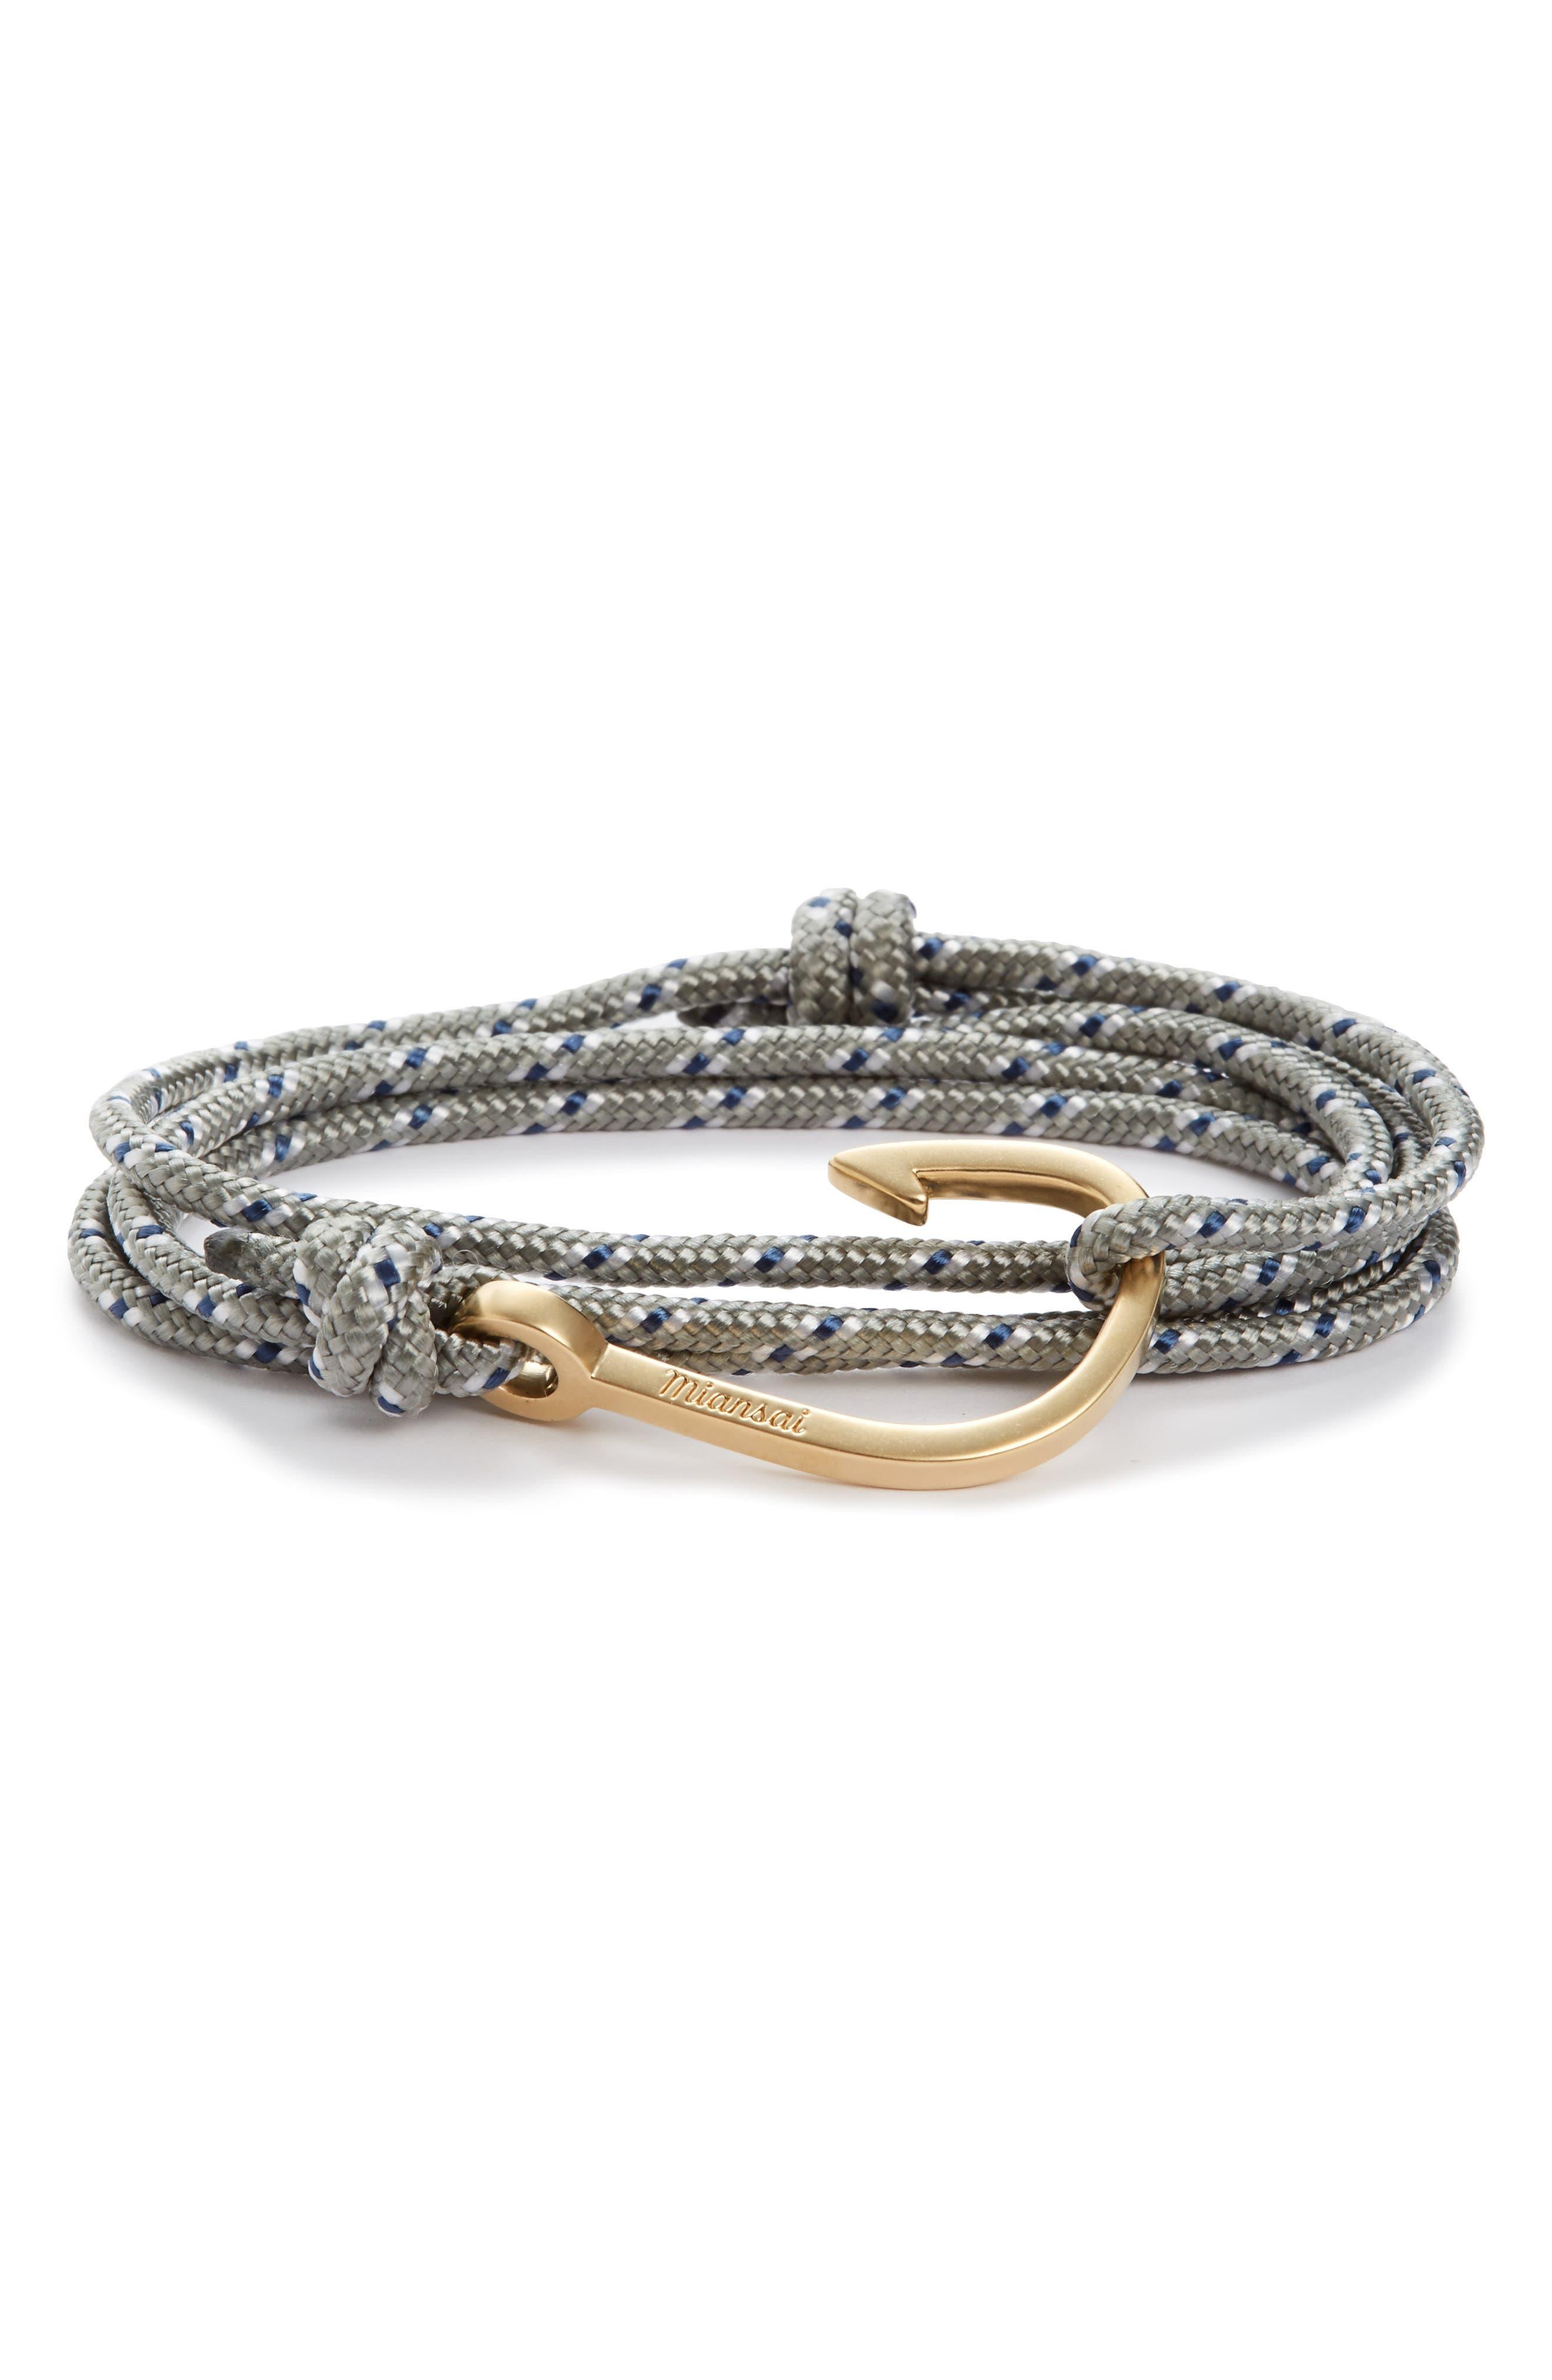 Hook Rope Wrap Bracelet,                             Main thumbnail 1, color,                             051